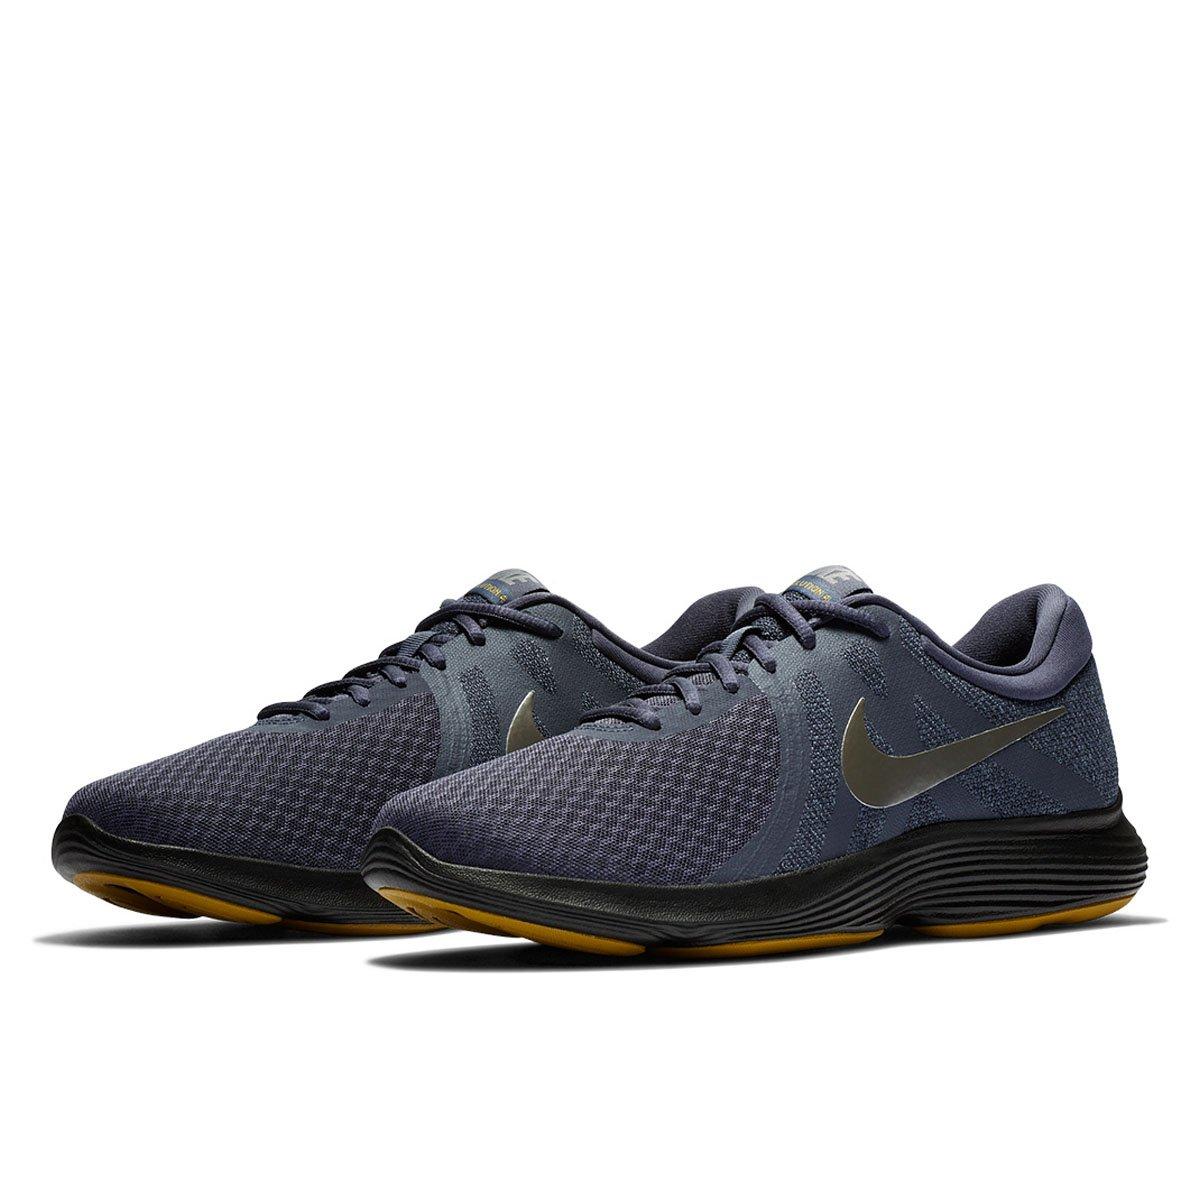 Tênis Nike Revolution 4 Masculino  Tênis Nike Revolution 4 Masculino ... 15b444b533759